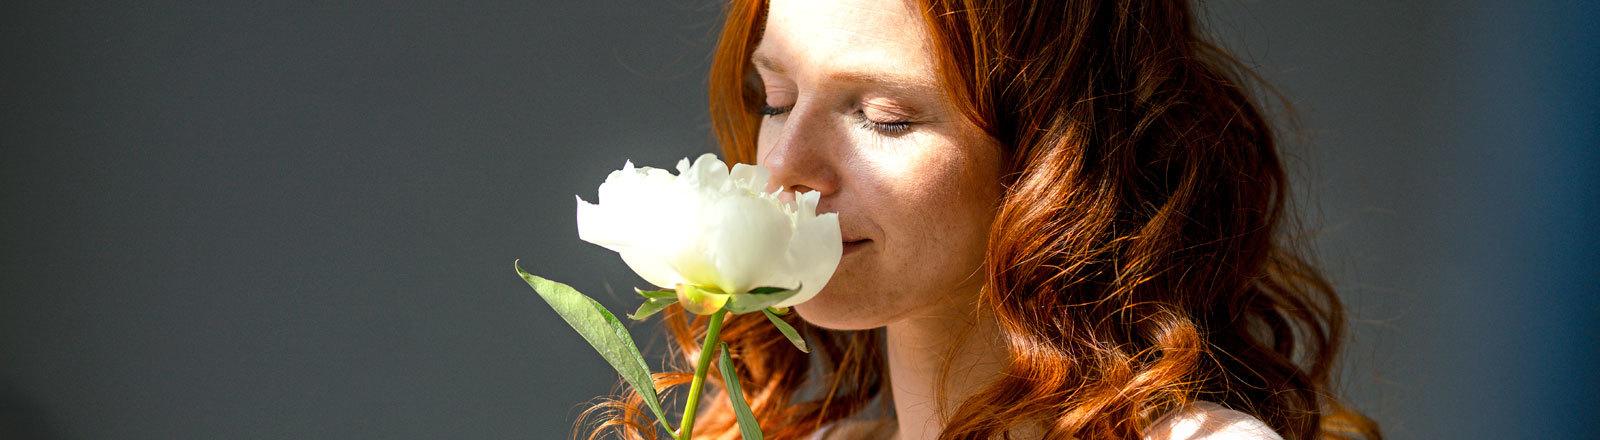 Rothaarige Frau riecht an weißer Blume.